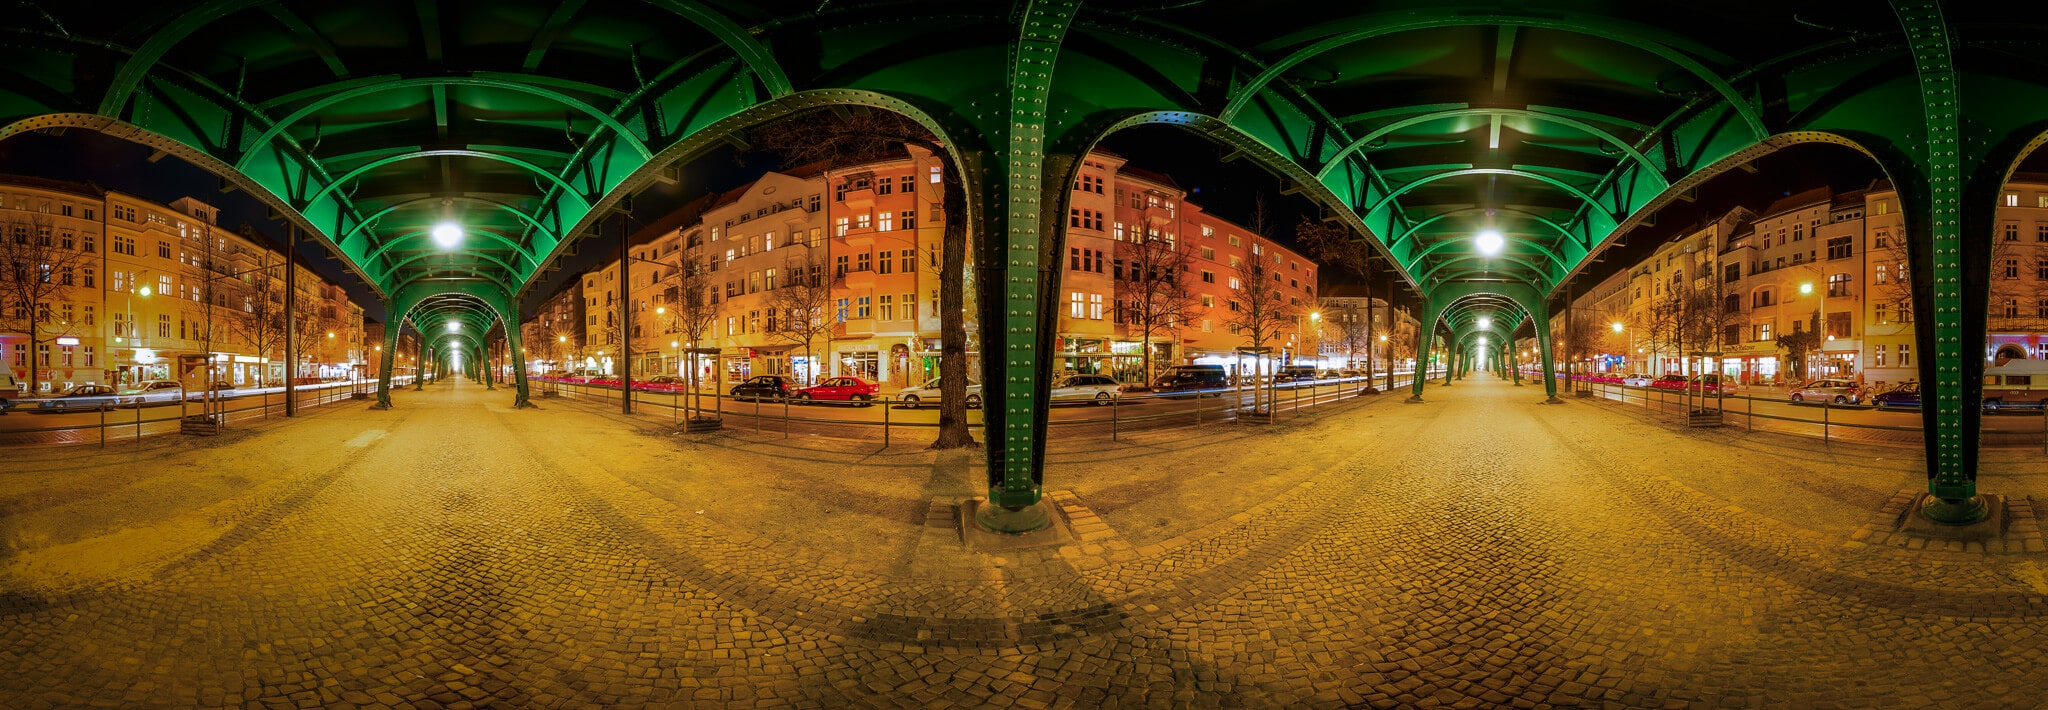 Panorama Berlin - Schönhauser Allee, (Foto copyright - Frank Weber - Berlin - fotologbuch.de)